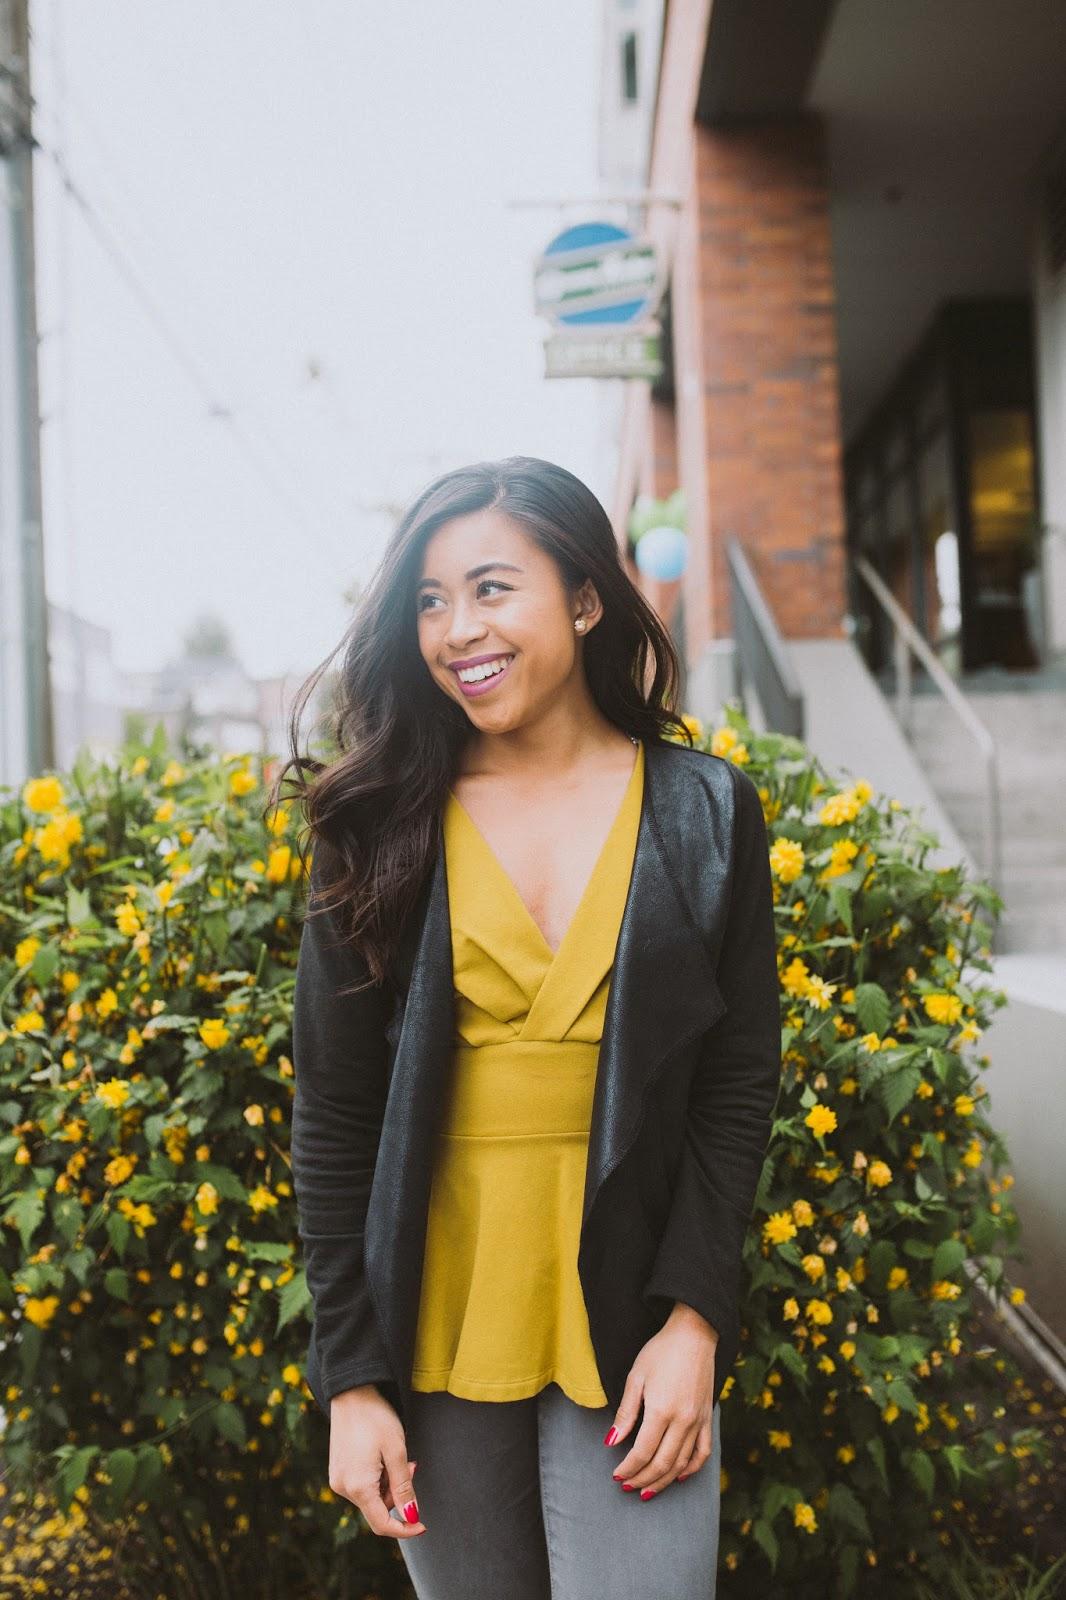 How do I Balance a Blog & Career?